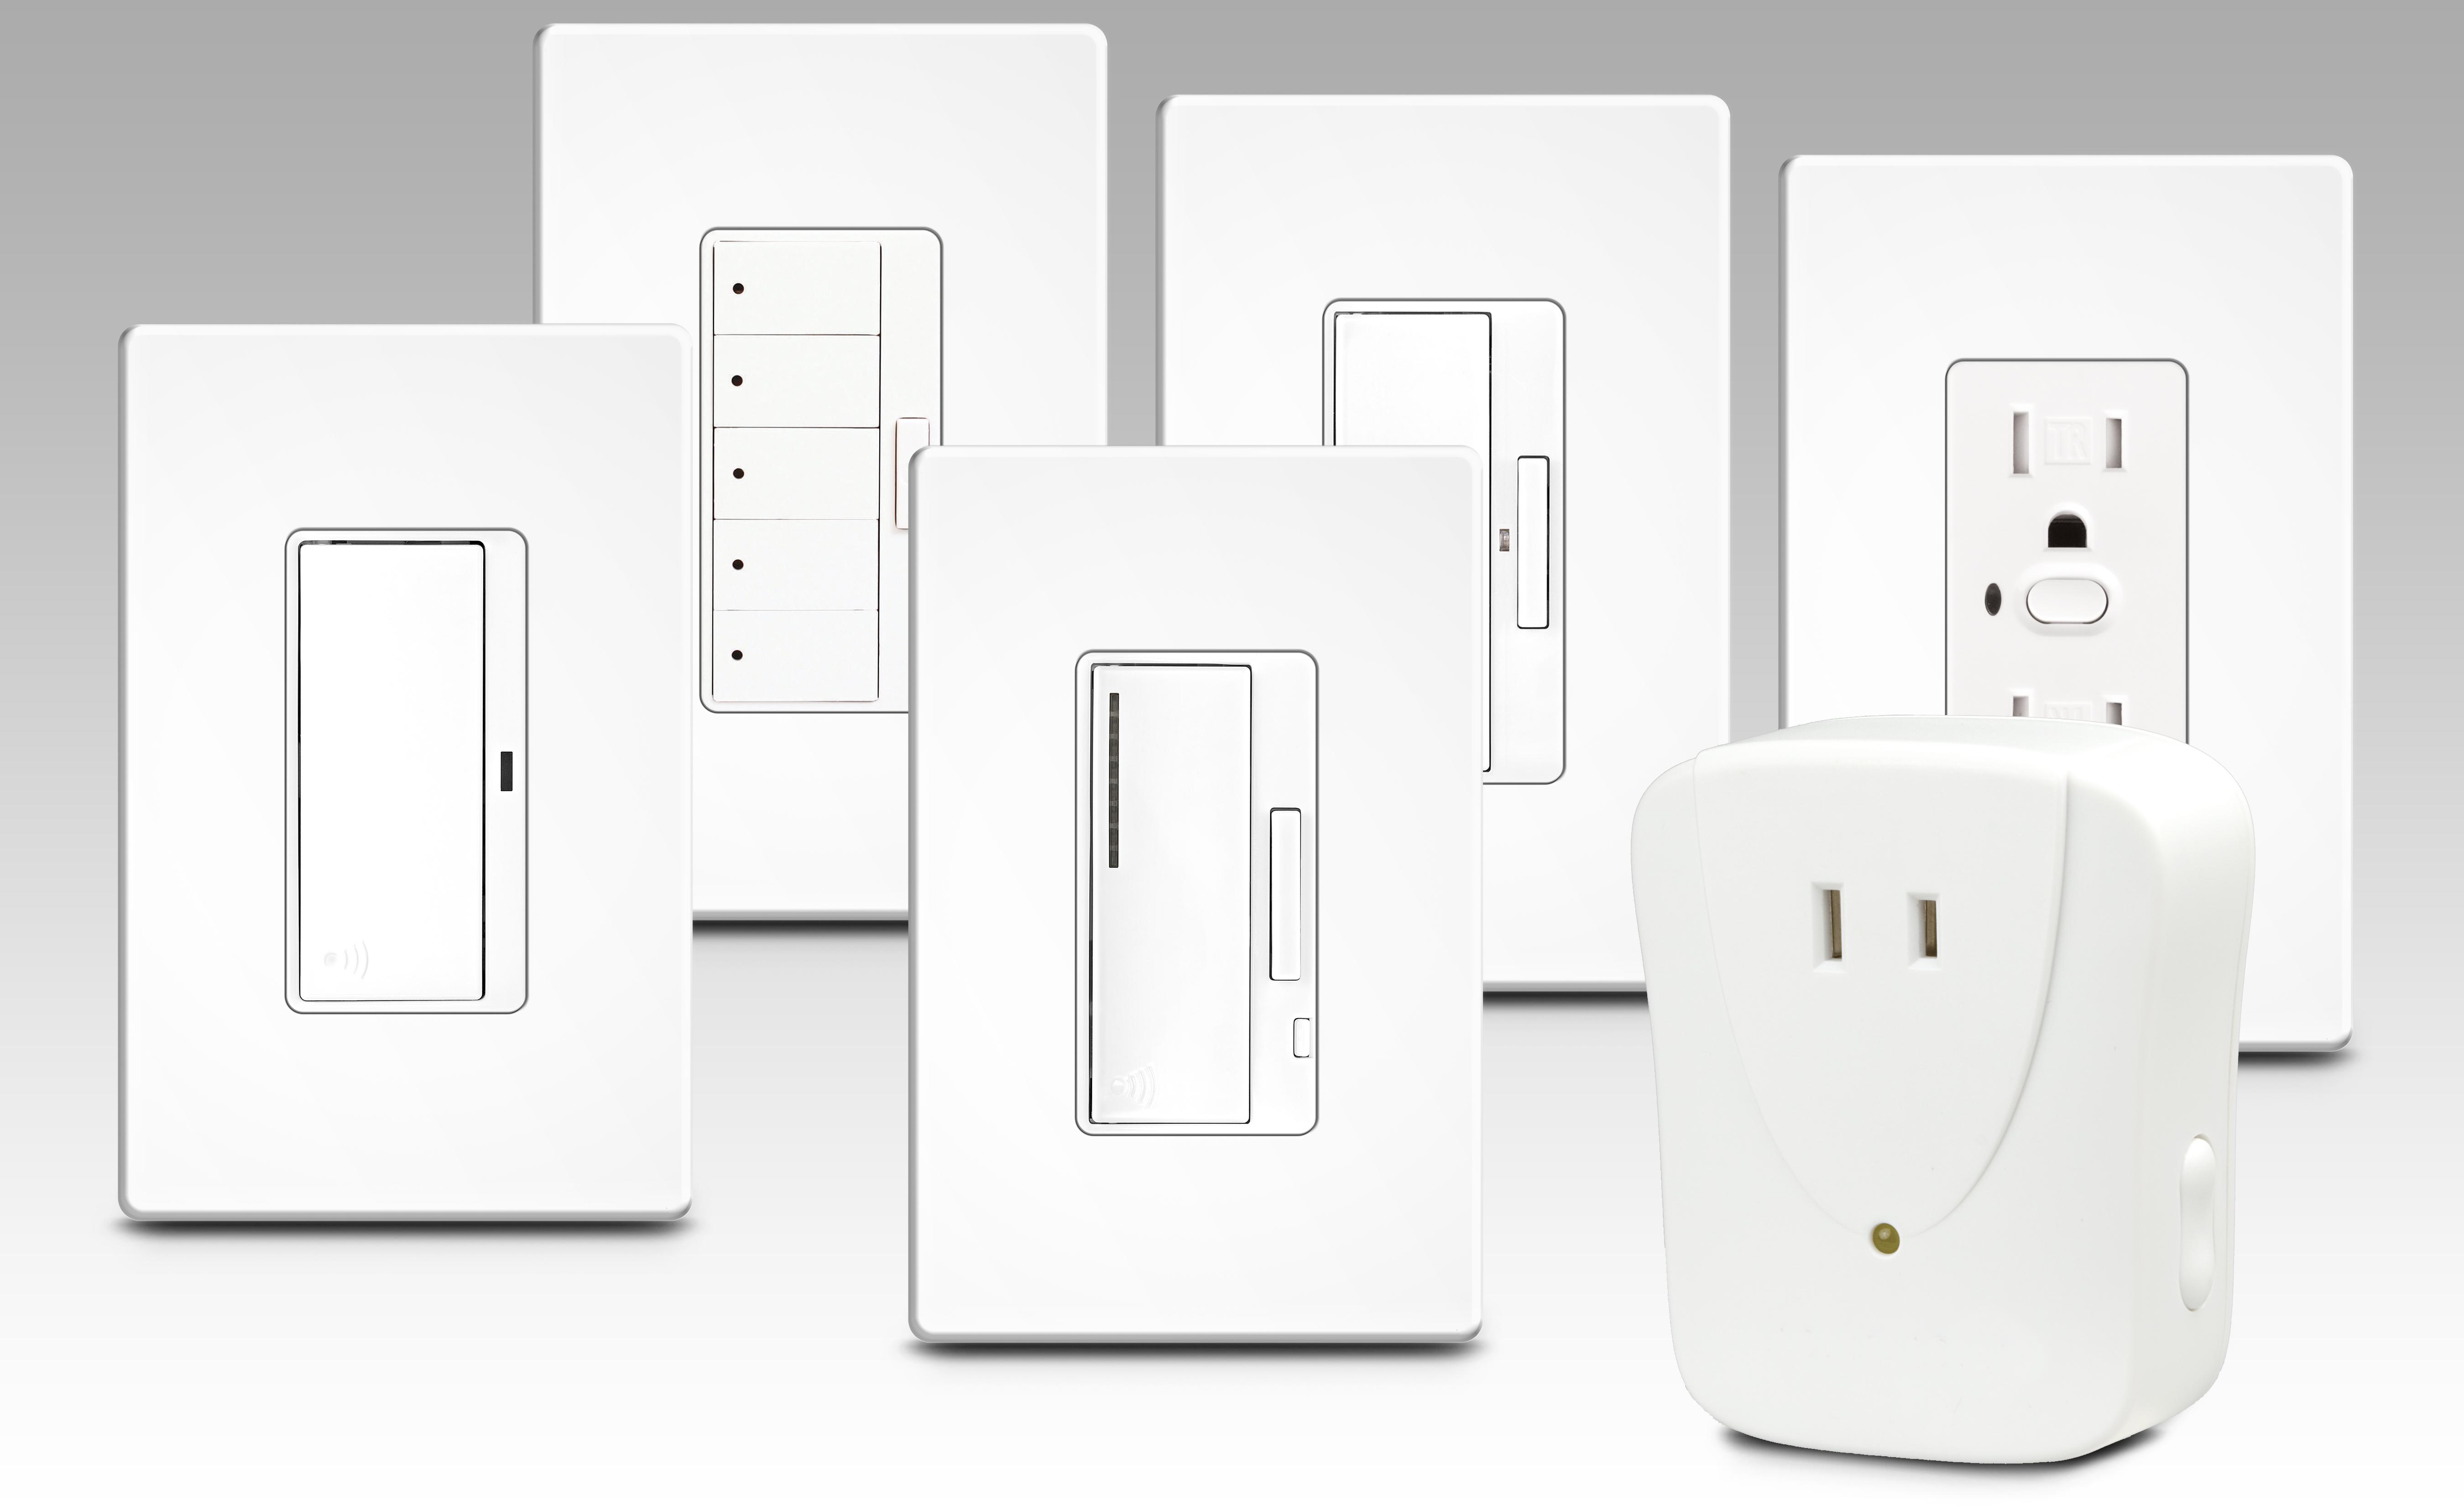 ZW9 Z-Wave Interface .ingearpr.com/RTI/RTI_ZW9_Front.jpg. Z-Wave Lighting Control Solutions ...  sc 1 st  RTI & RTI Now Shipping New Z-Wave Control and Lighting Solutions | RTI azcodes.com